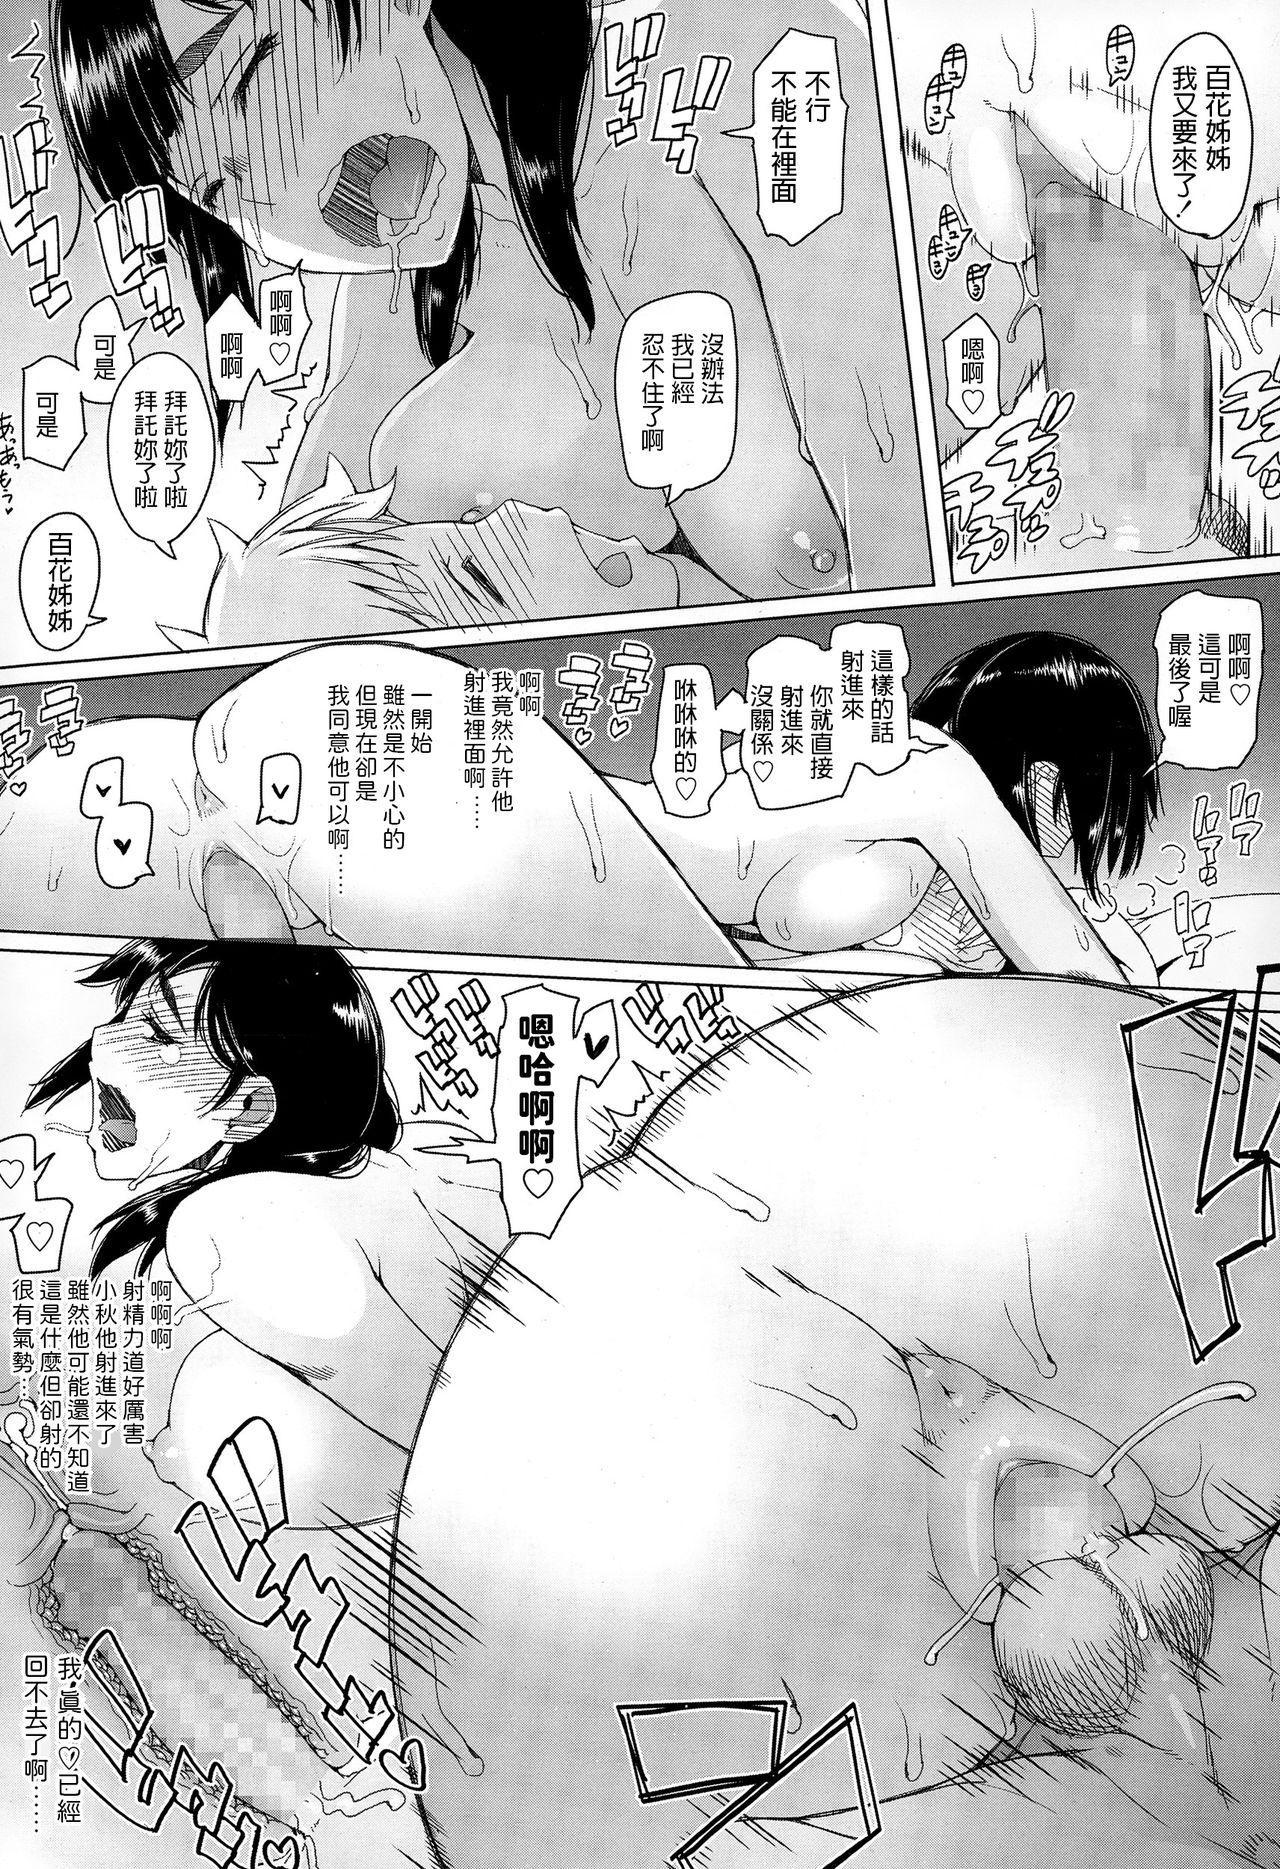 朝木貴行   女子高生のお留守番  COMIC 高 Vol.4  中文翻譯 13